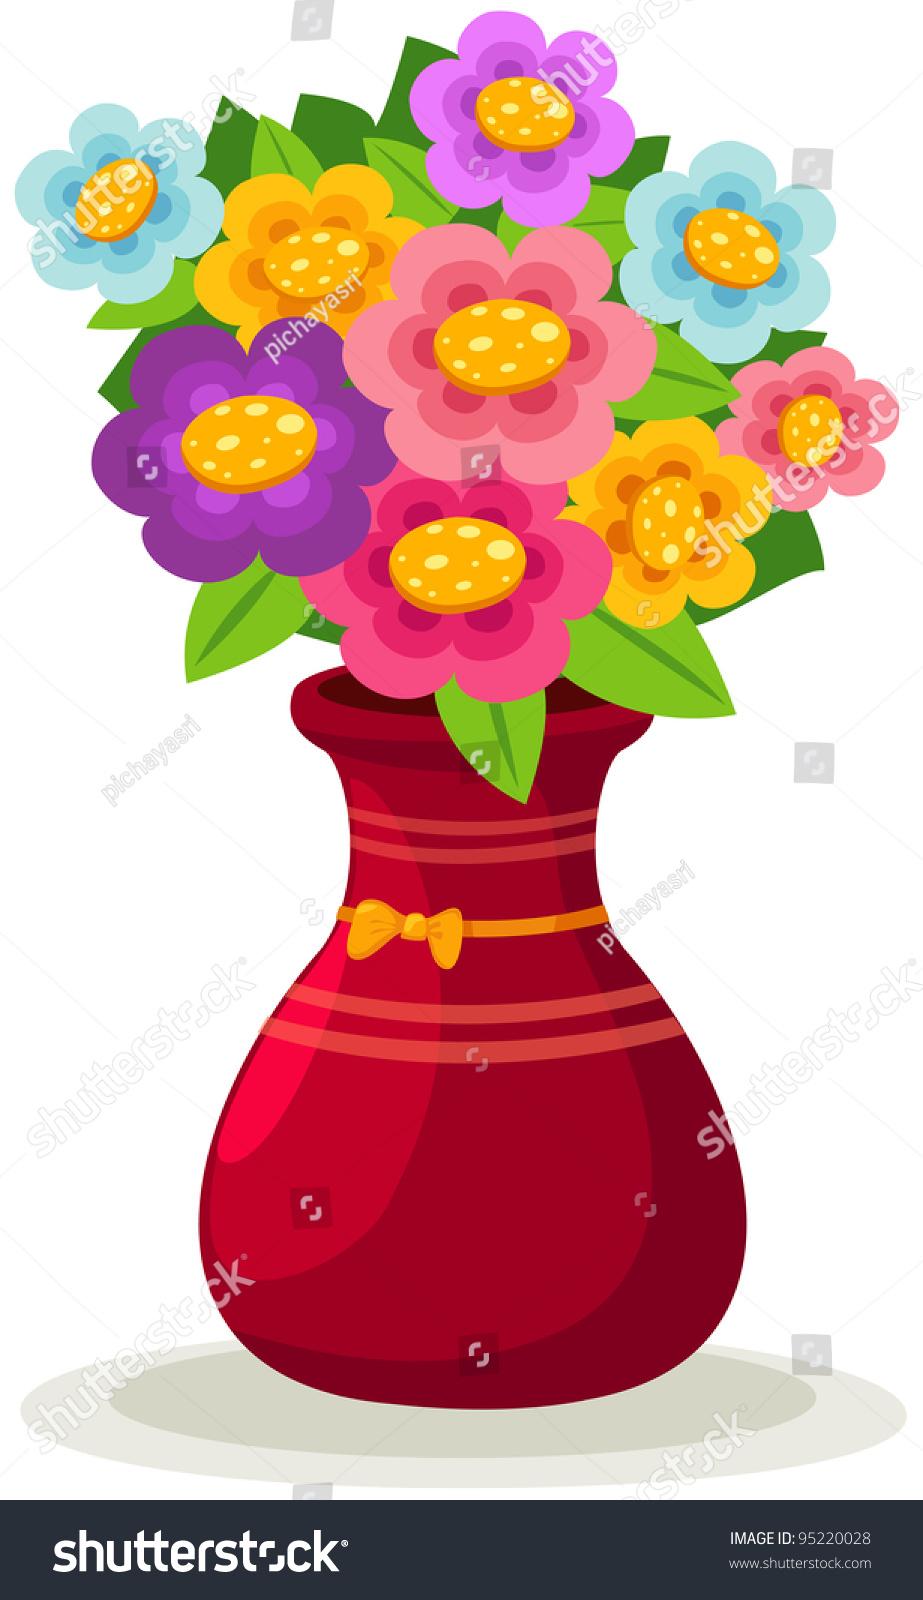 Illustration Isolated Colorful Flowers Vase On Stock Illustration ...